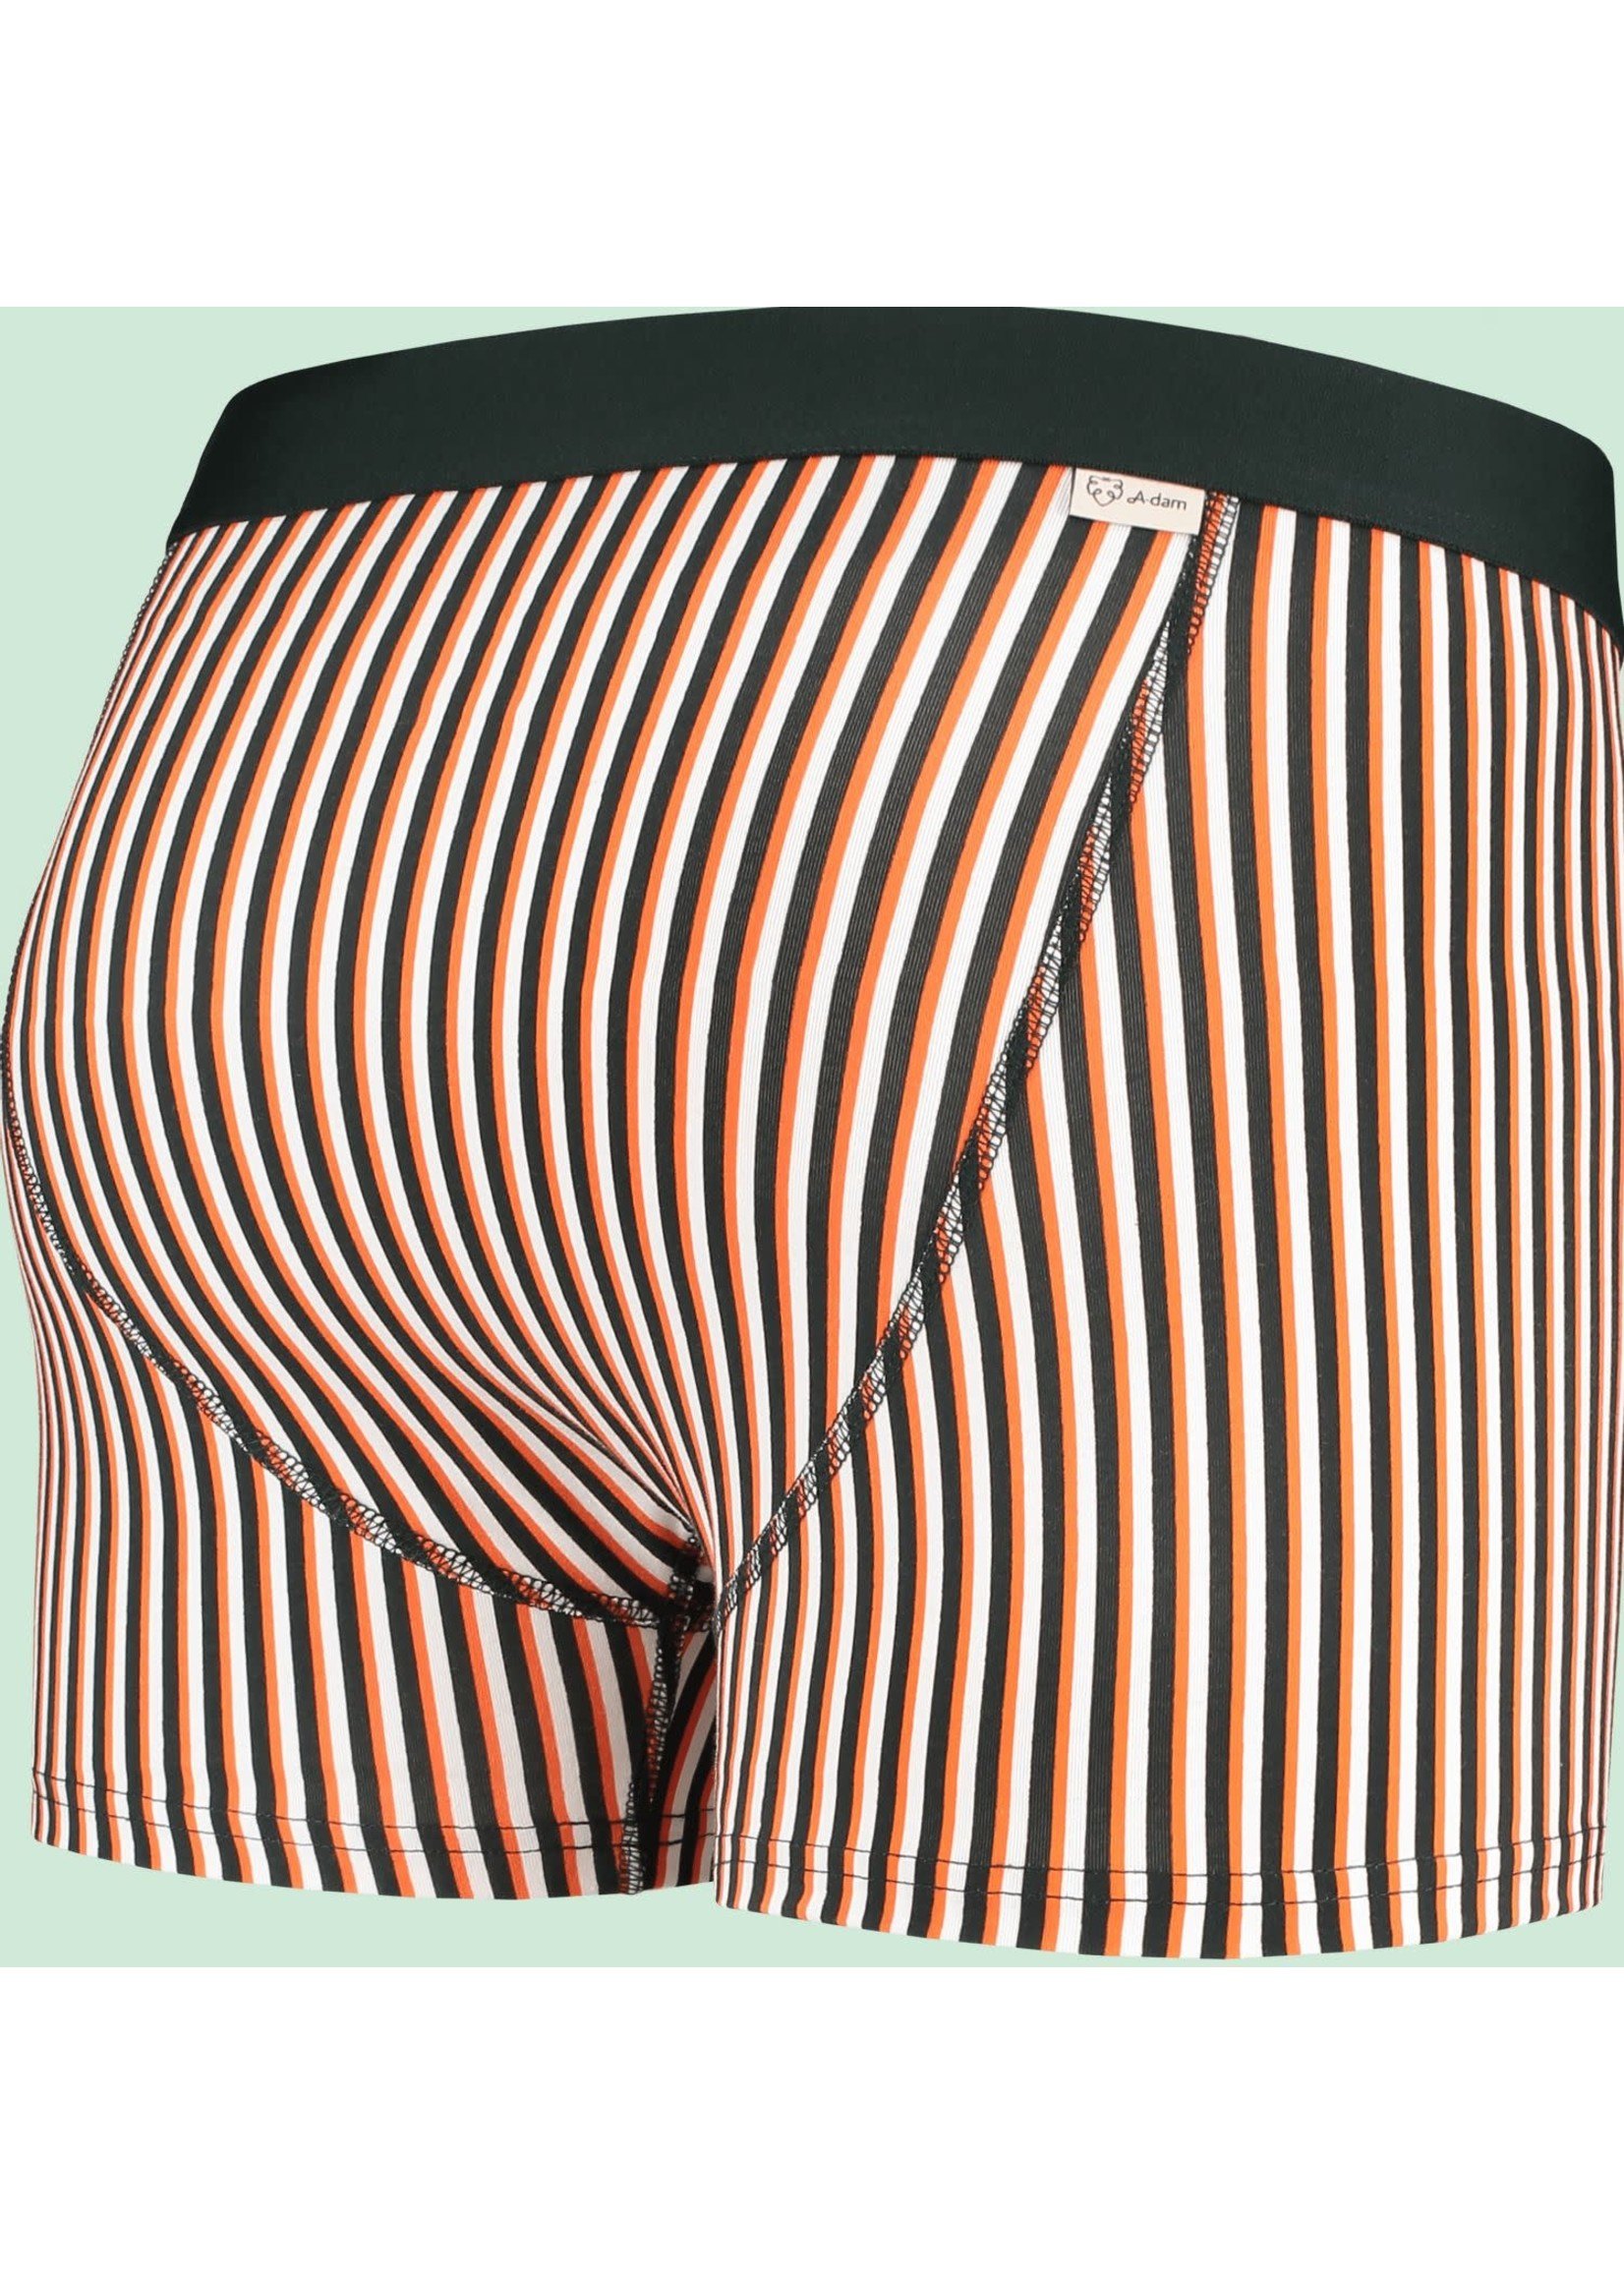 A-dam Underwear boxer Maarten